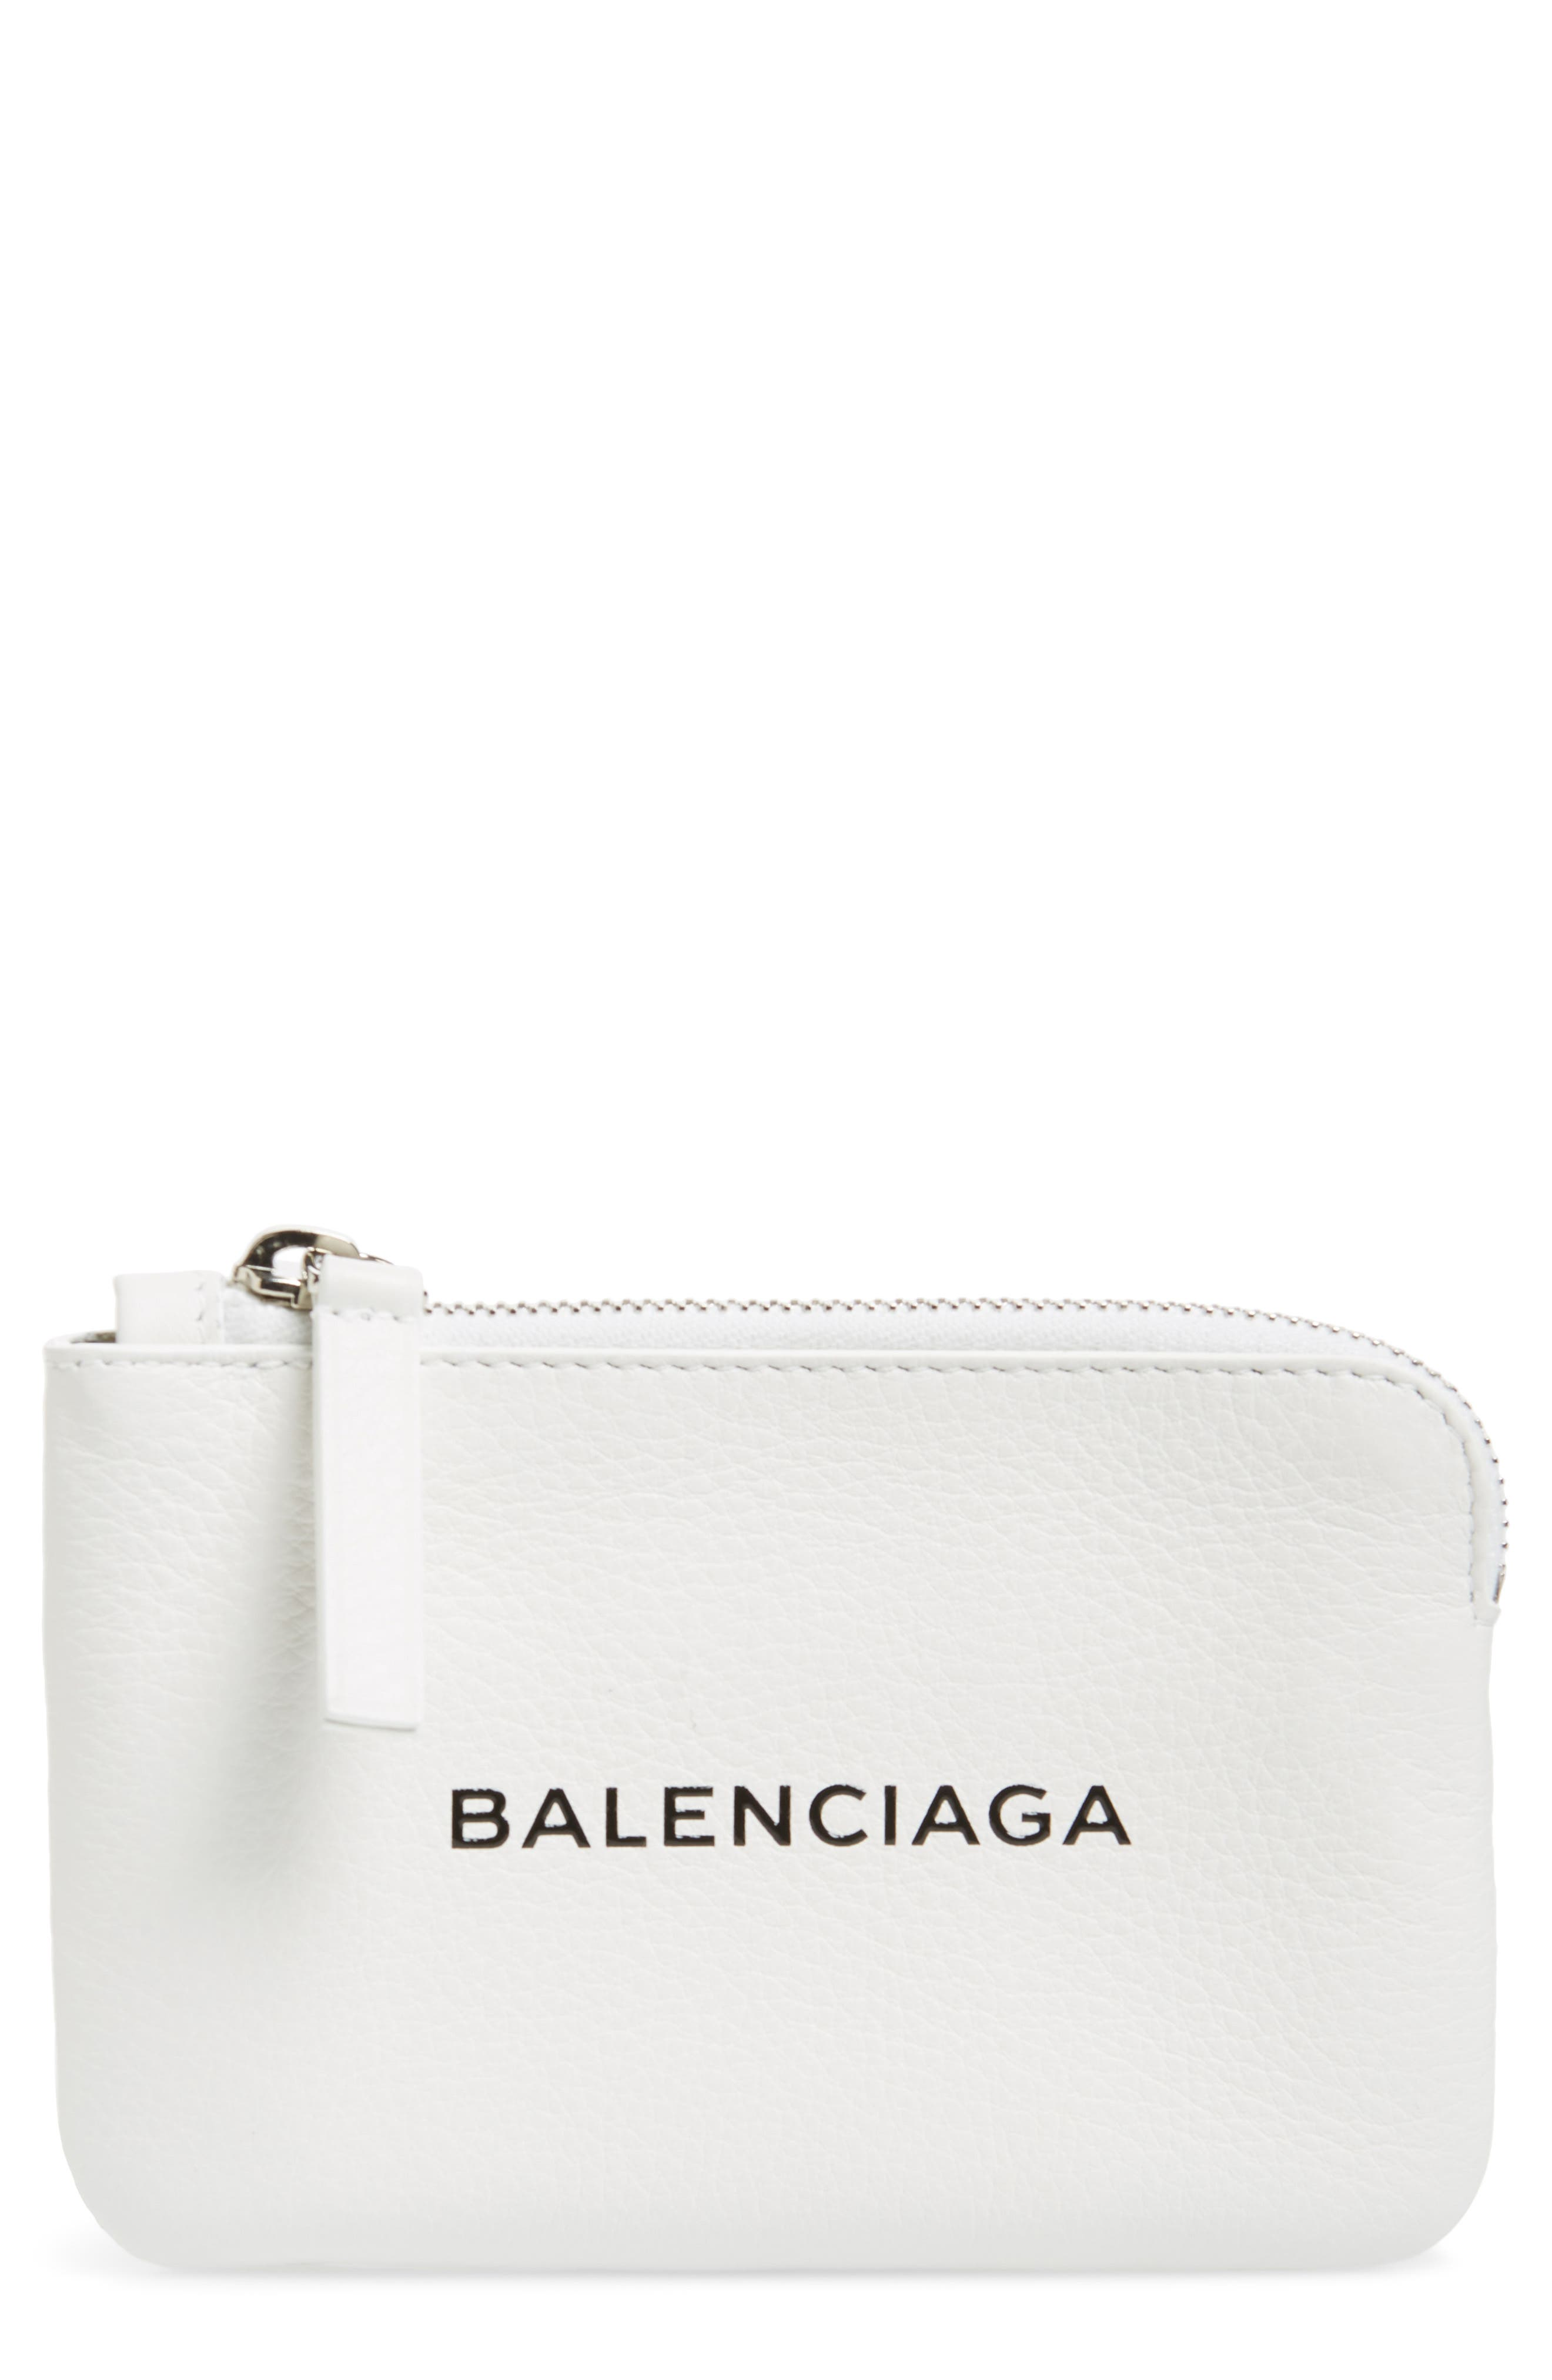 BALENCIAGA,                             Everyday Leather Pouch,                             Main thumbnail 1, color,                             BLANC OPTIQUE/ NOIR